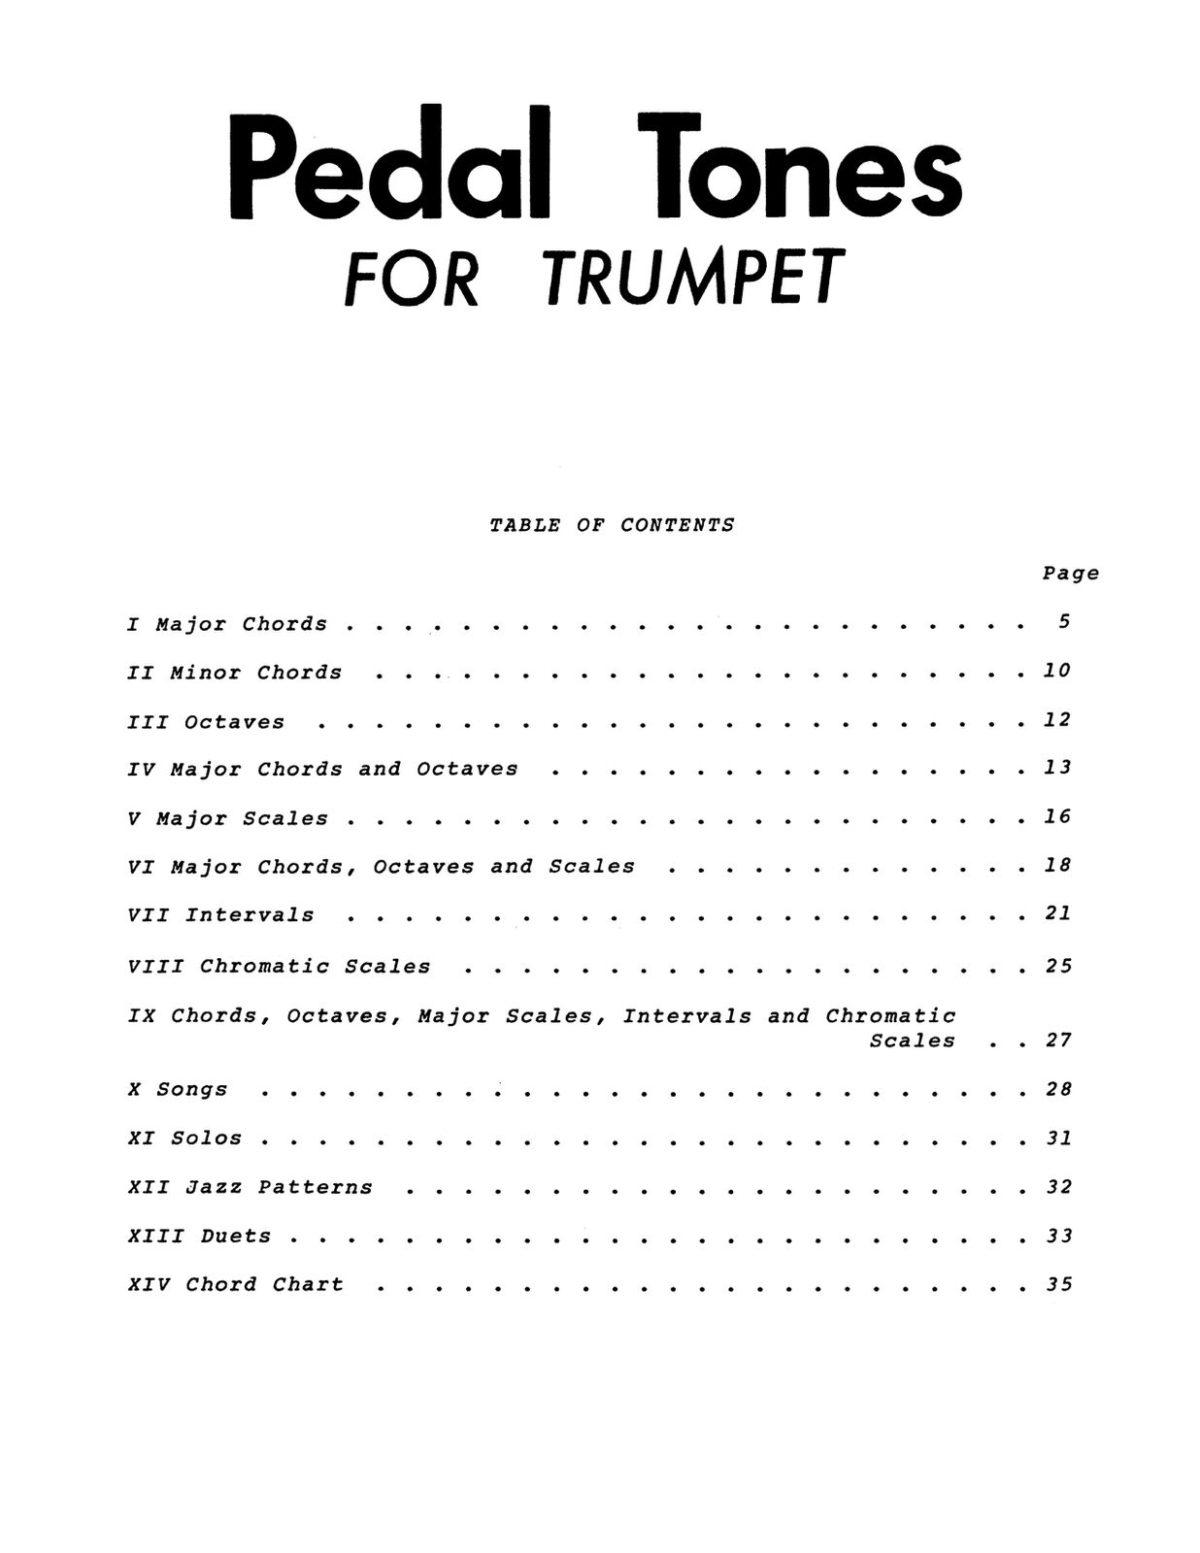 Branch, Pedal Tones for Trumpet-p03